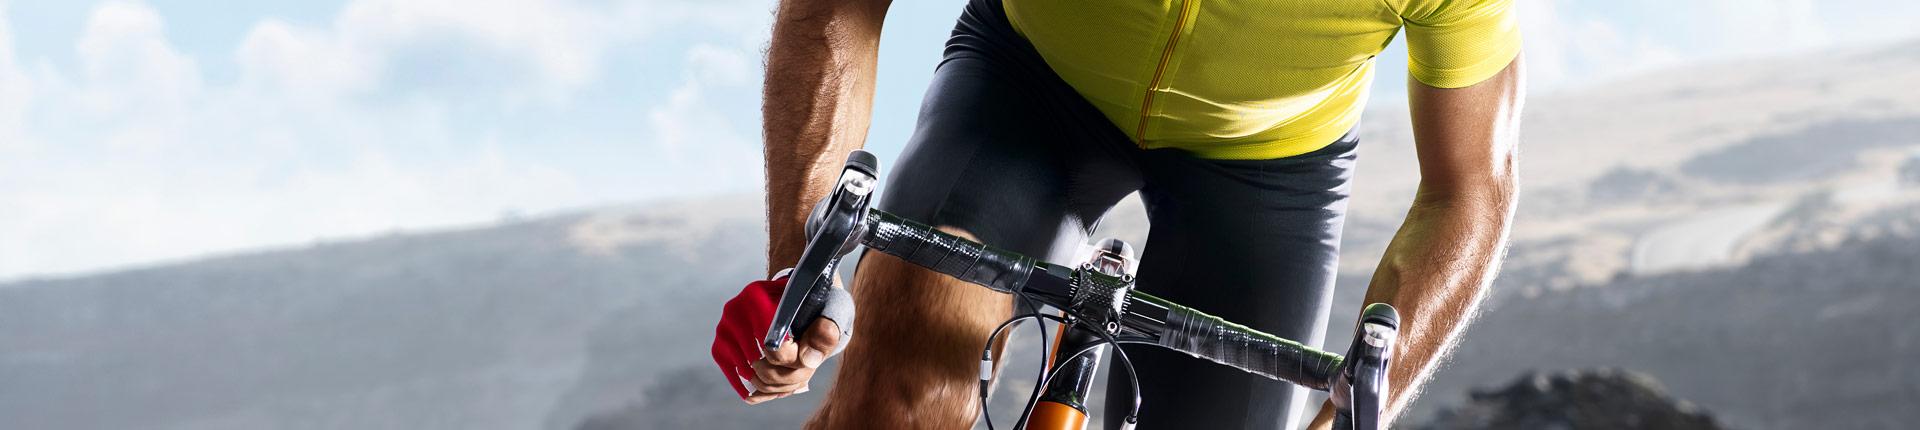 Trening kolarski: Banany vs napój z cukrem - co lepsze dla kolarza?